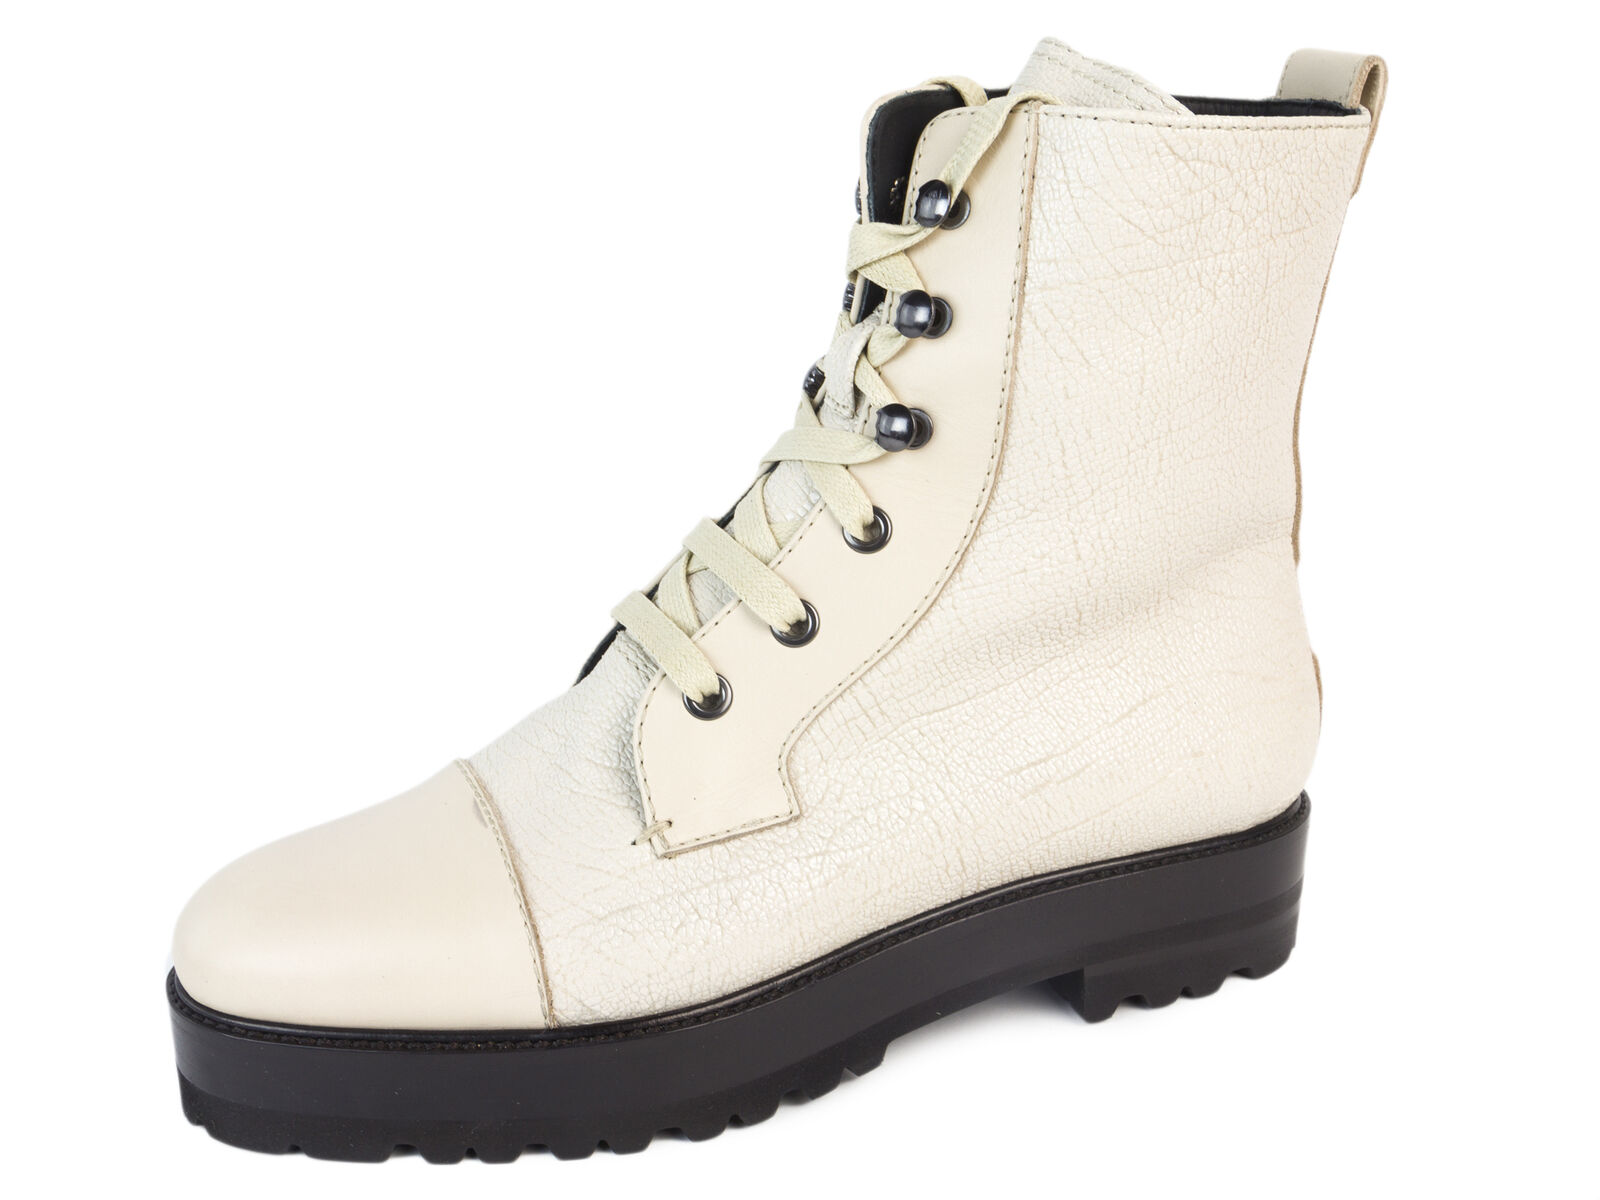 MAX MARA Women's Peana Albino Leather Combat Boots US 7 / IT 37 $745 NIB